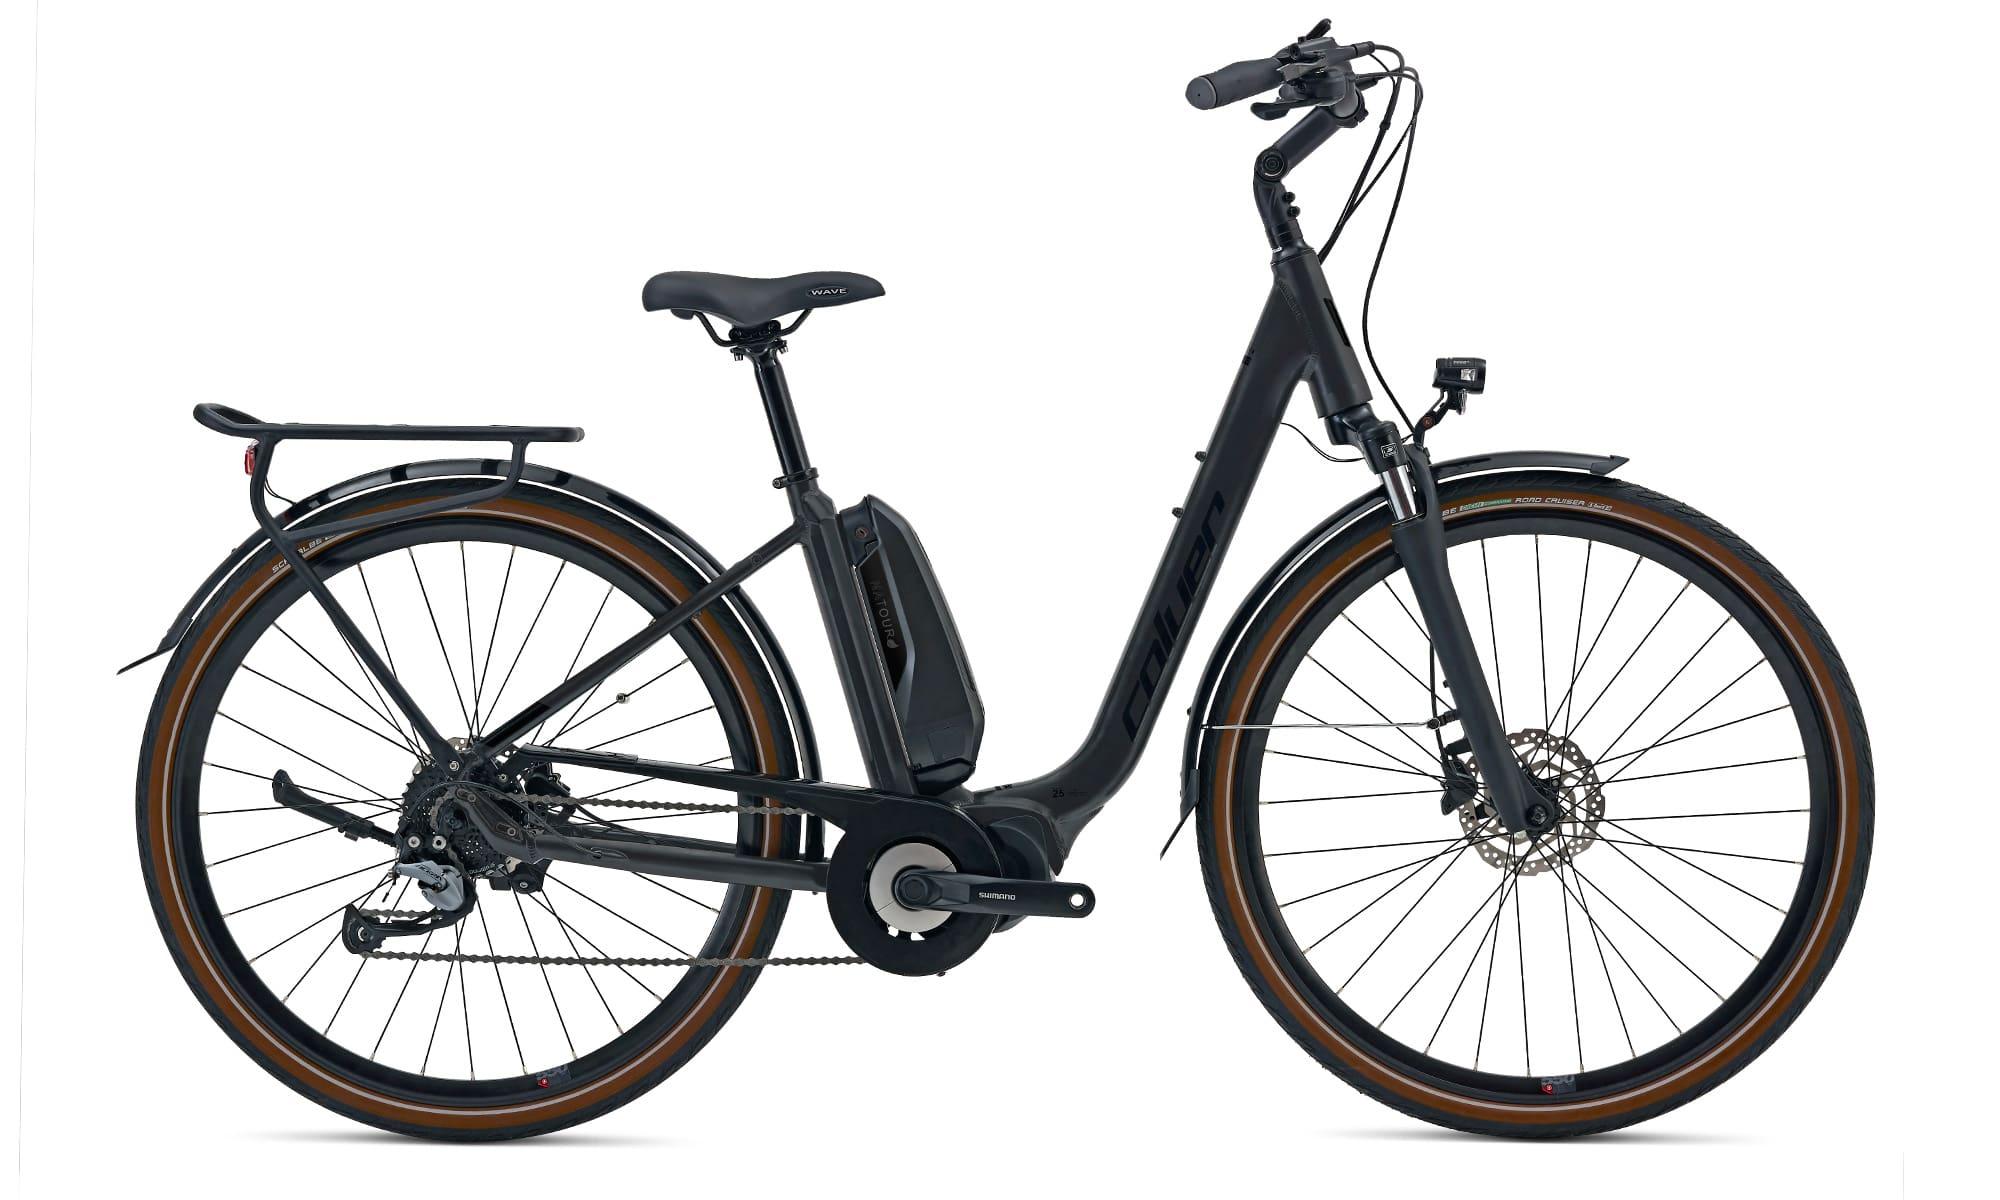 Mid Drive Ladies electric bike Coluer Natour Black